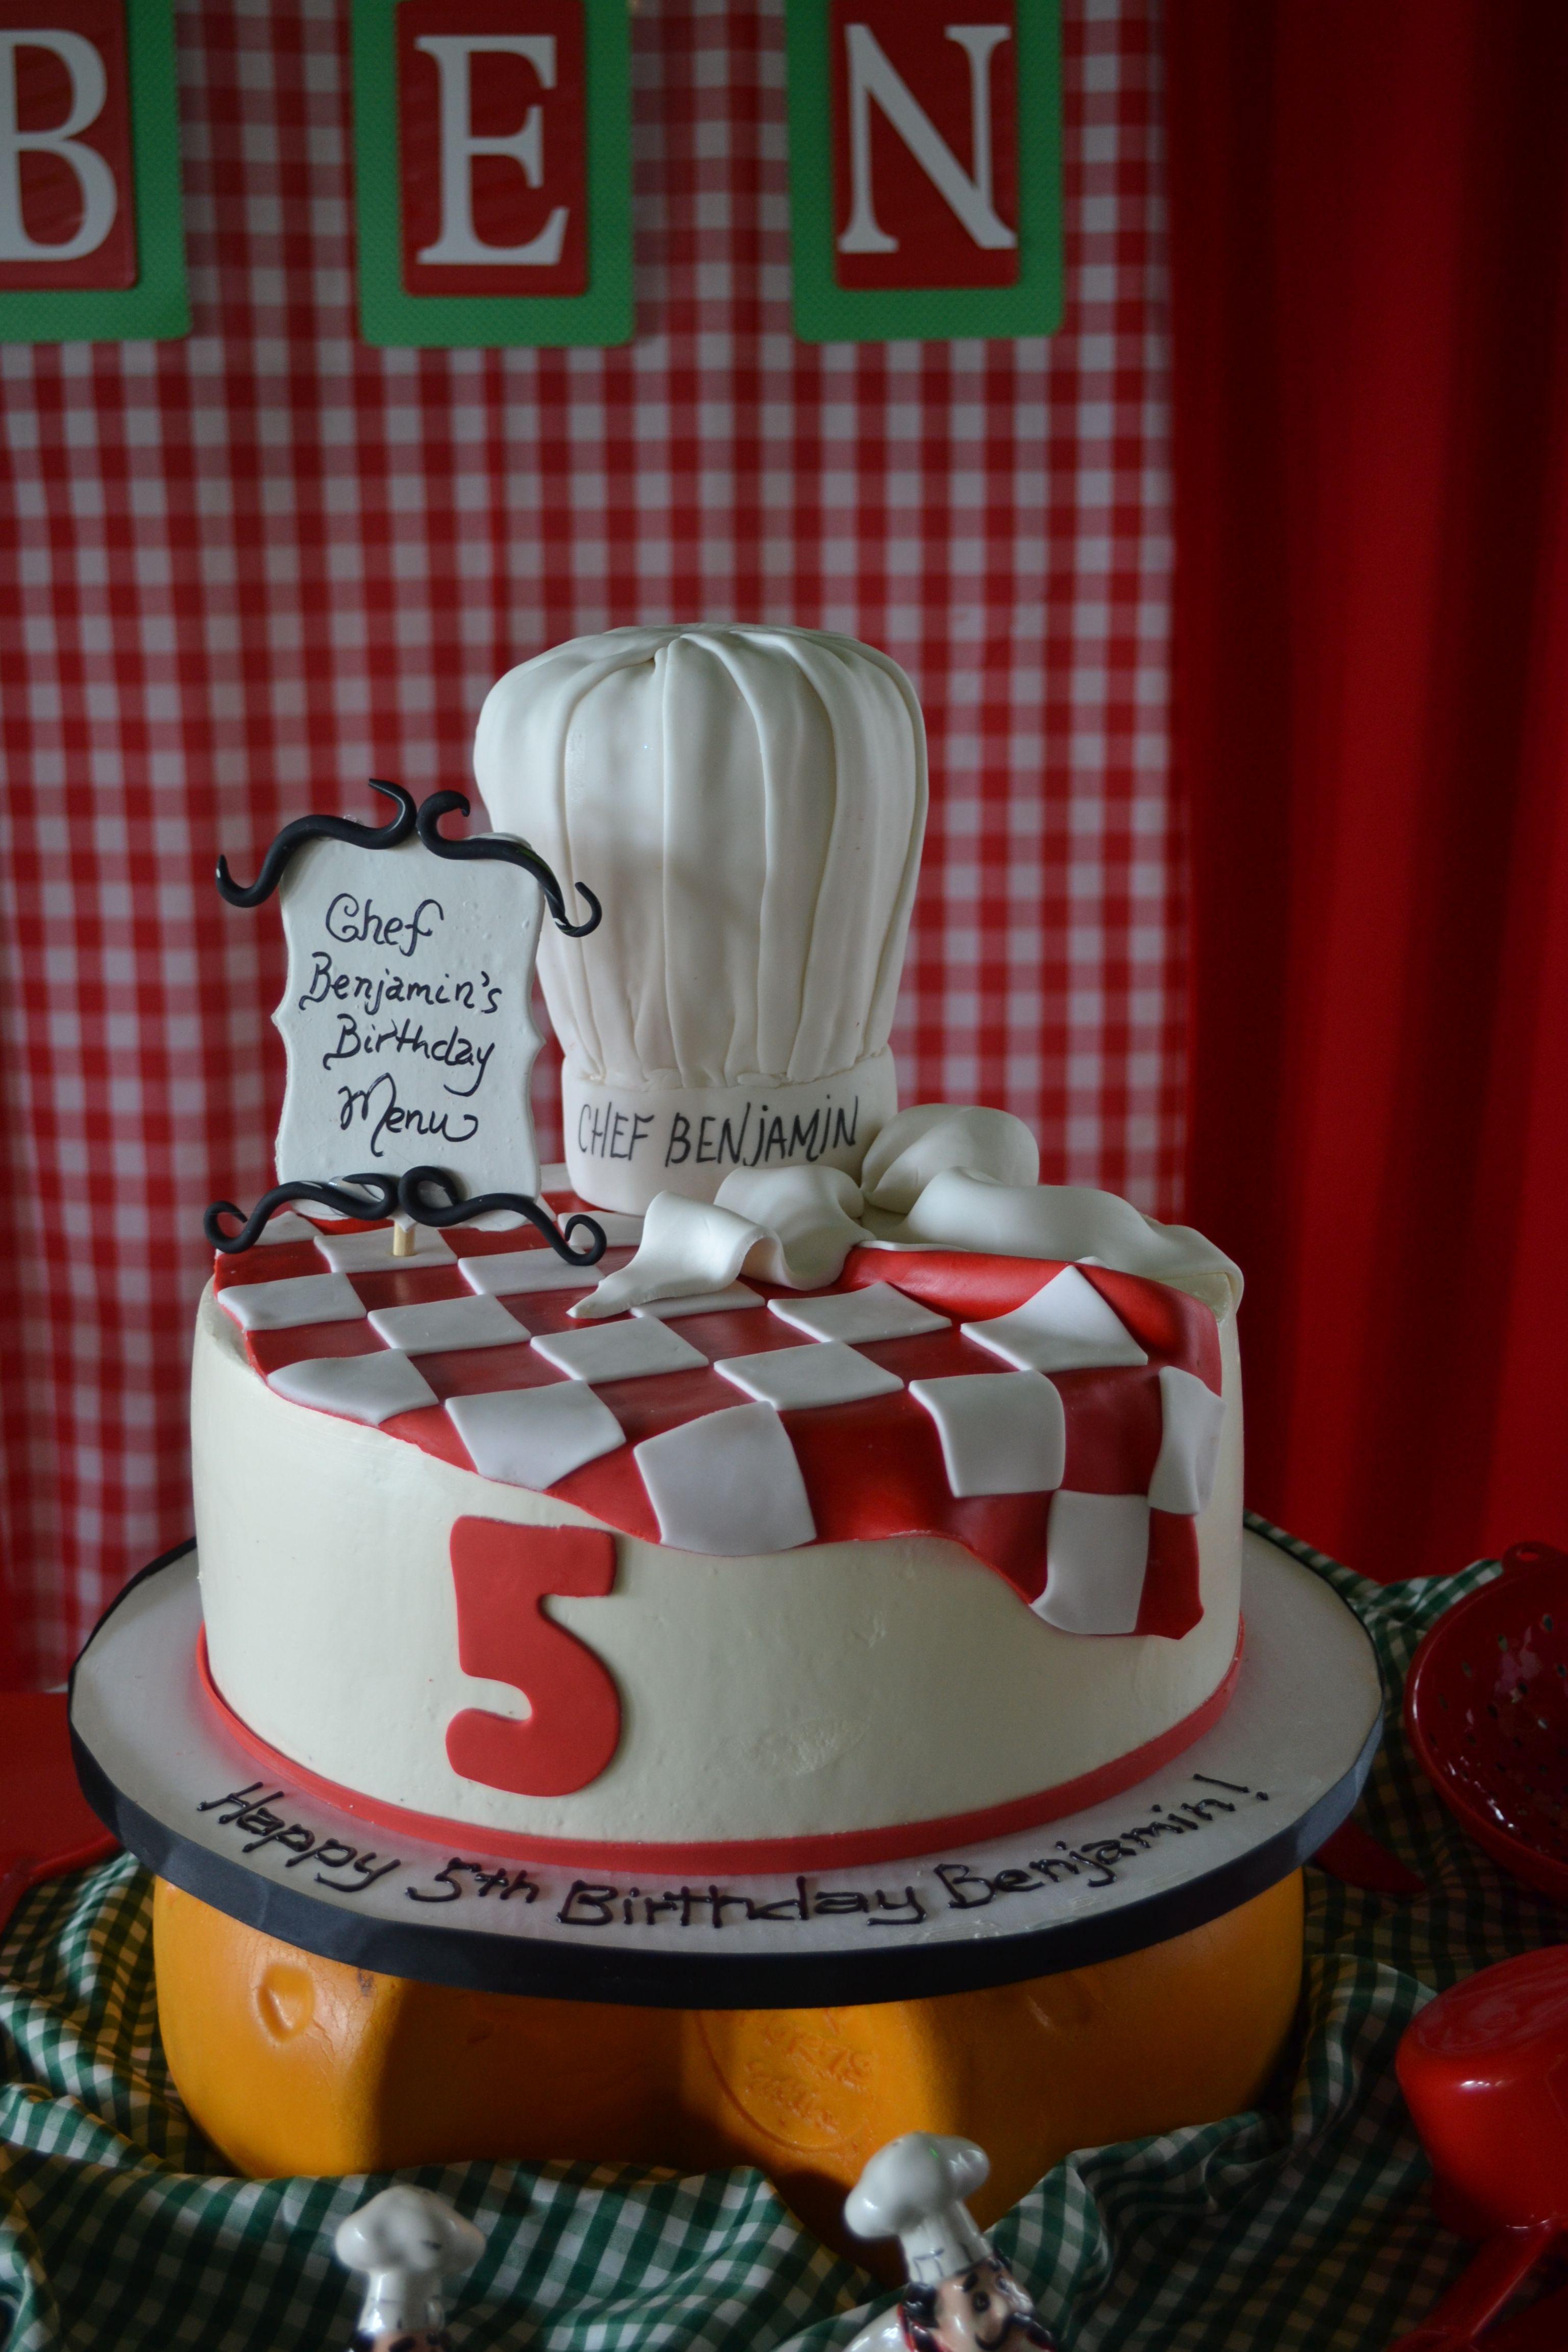 cake chef theme | CLAUDIA BARROS EVENTS | Pinterest | Inspiration ...